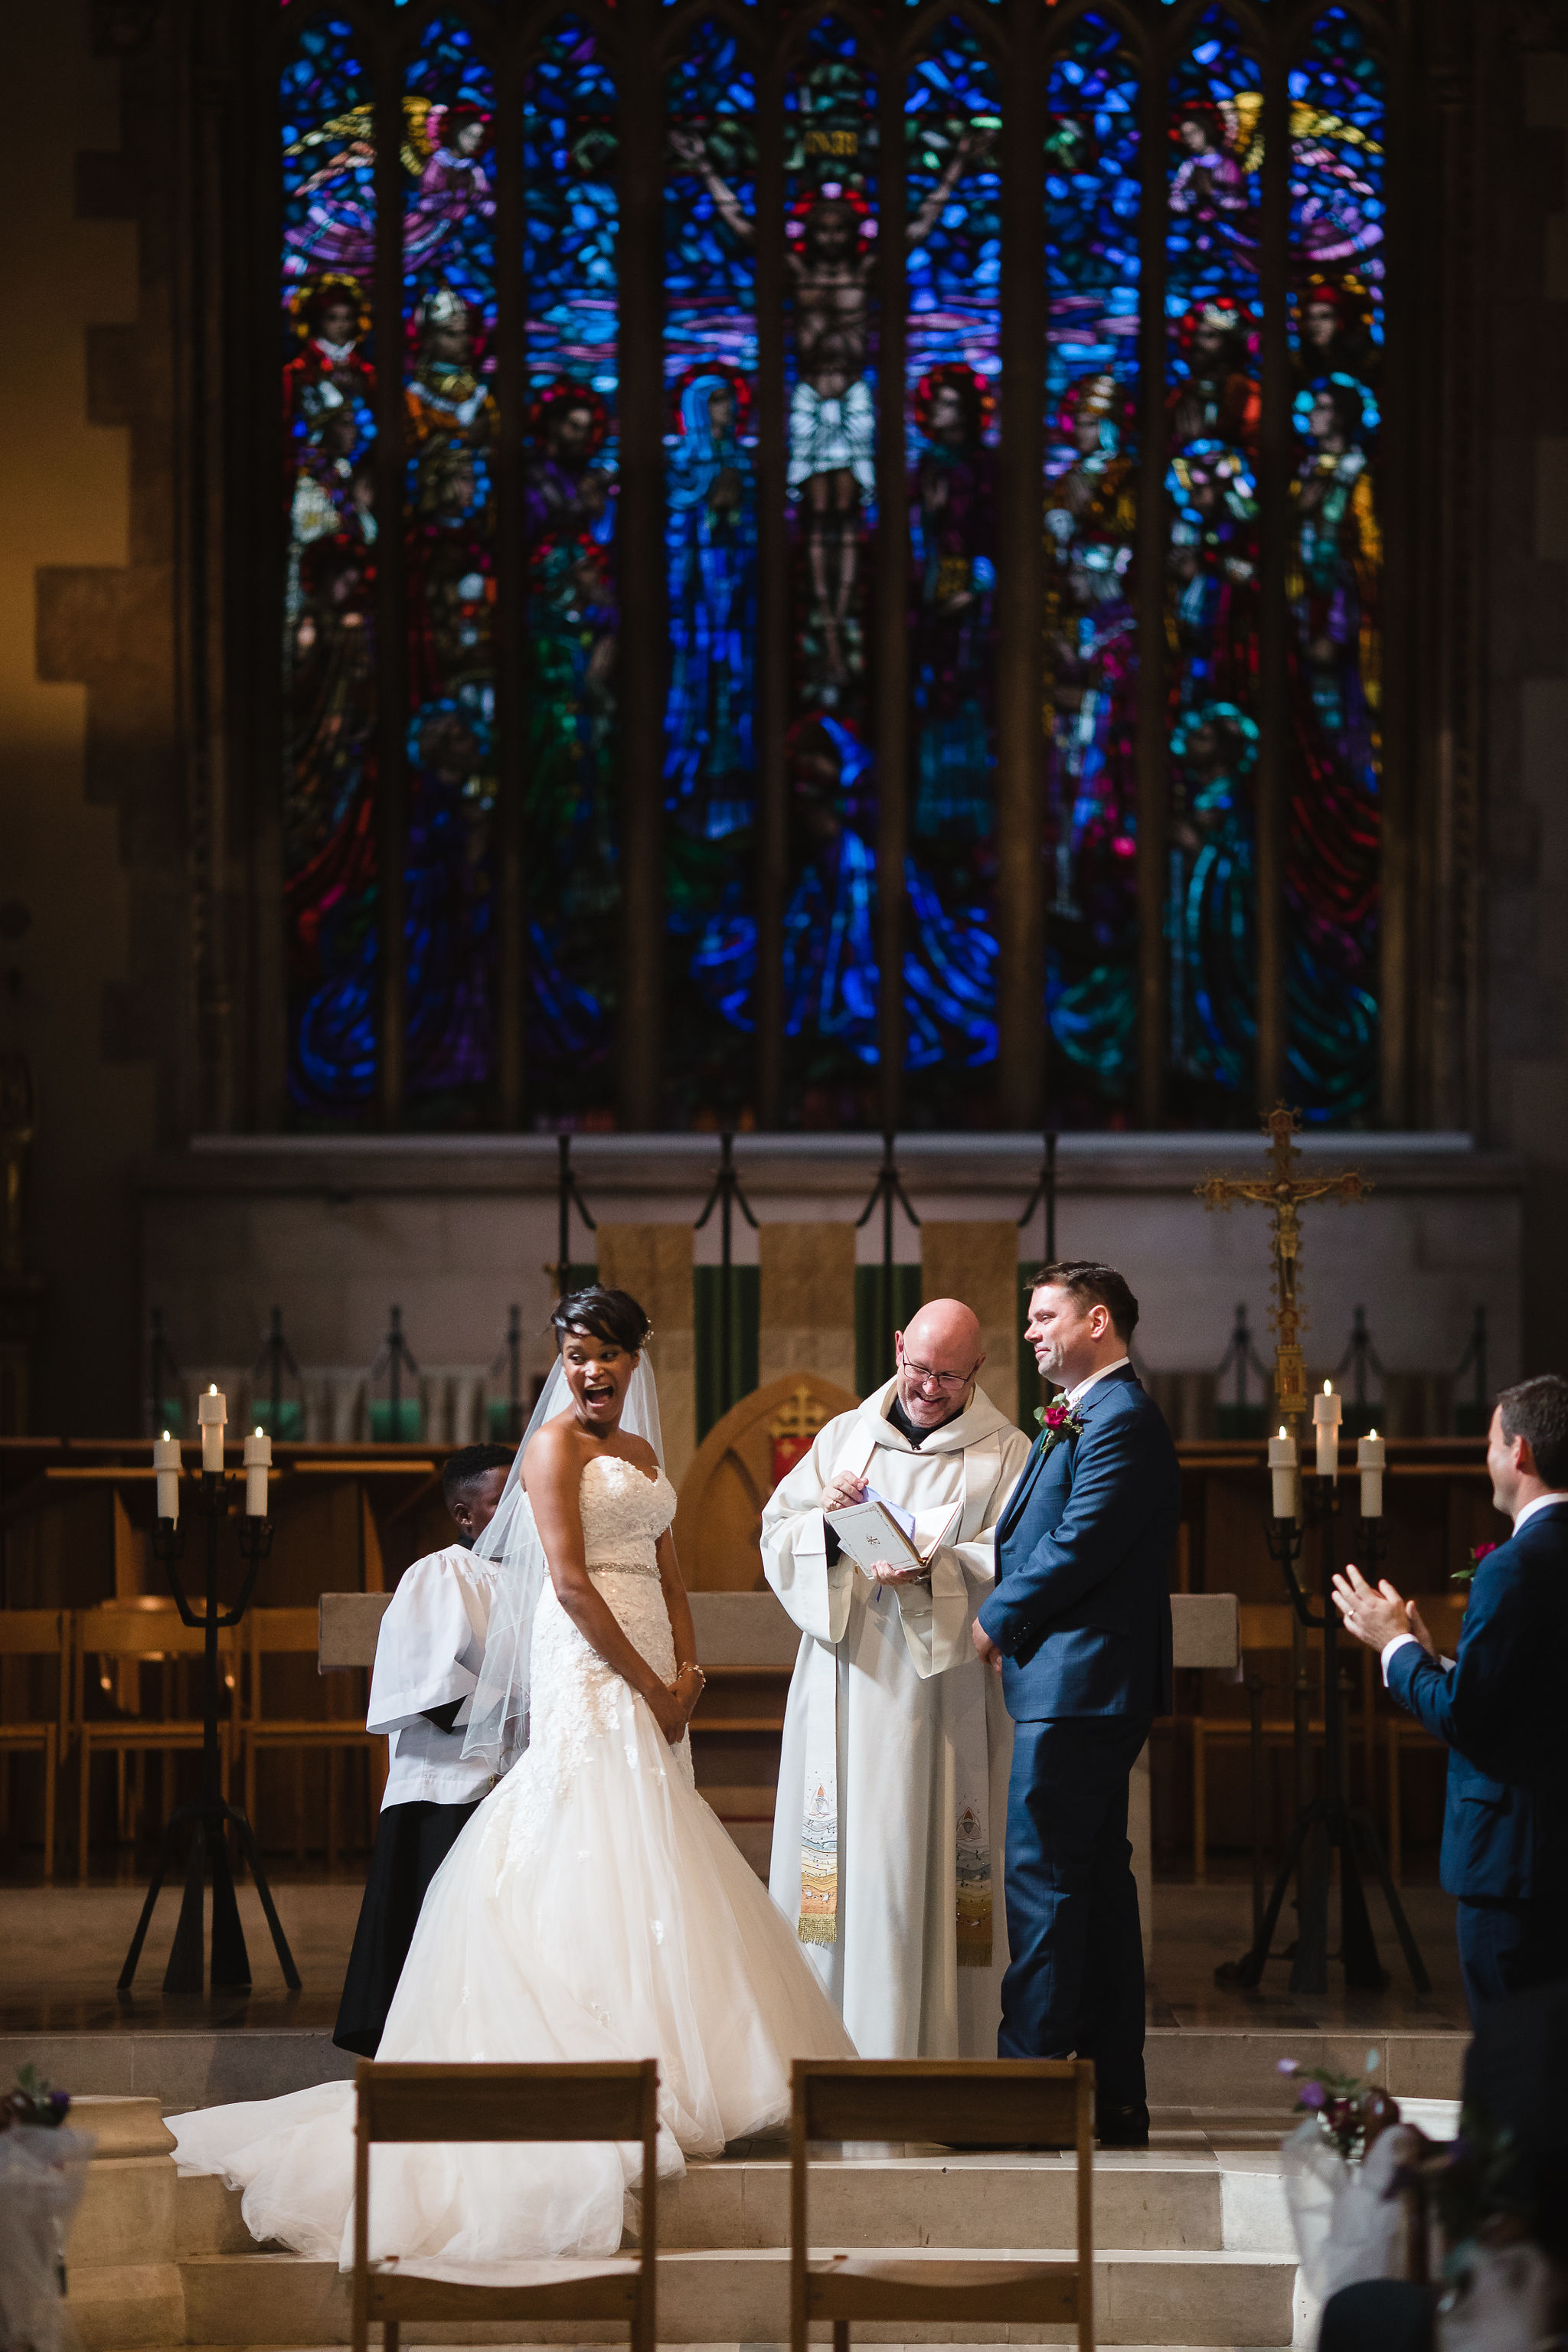 The Anthologist_Drake_and_Morgan_London_Wedding_58.jpg